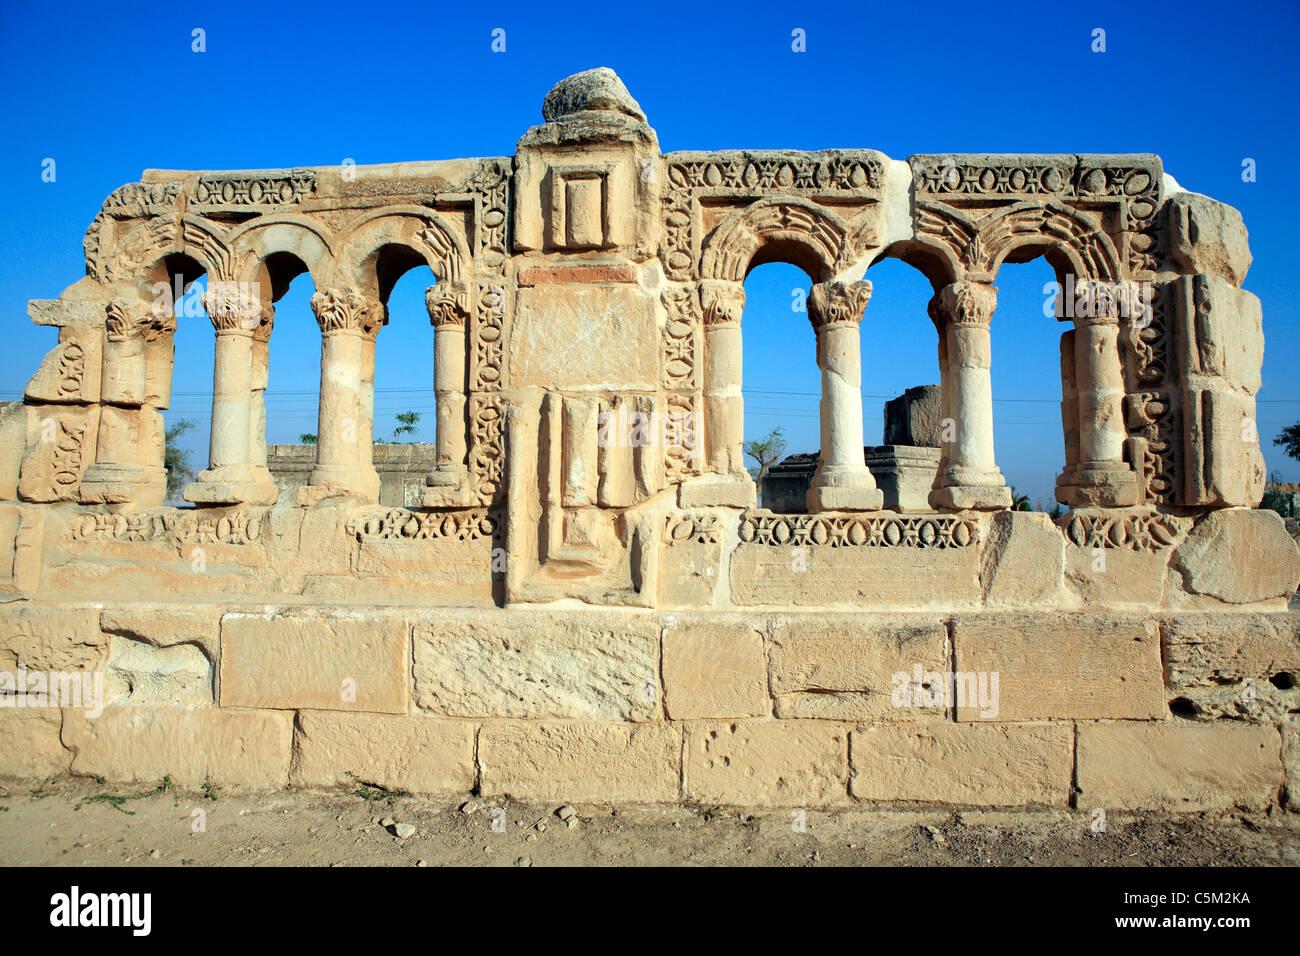 Umayyad palace Khirbat al-mafjar (750s), Jericho, Israel - Stock Image